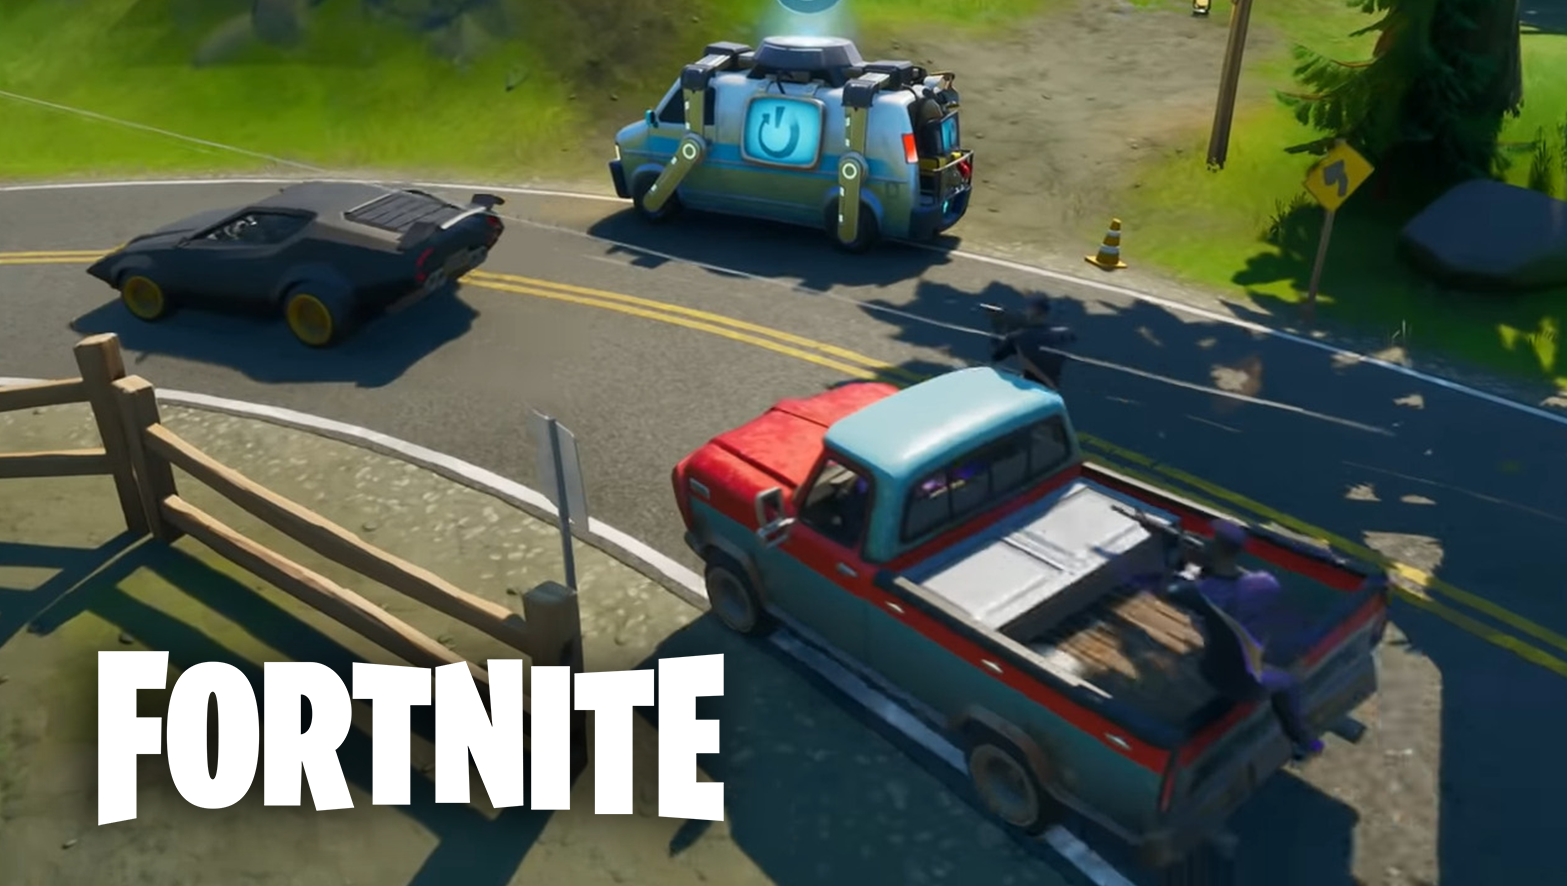 Fortnite Season 3 new vehicles